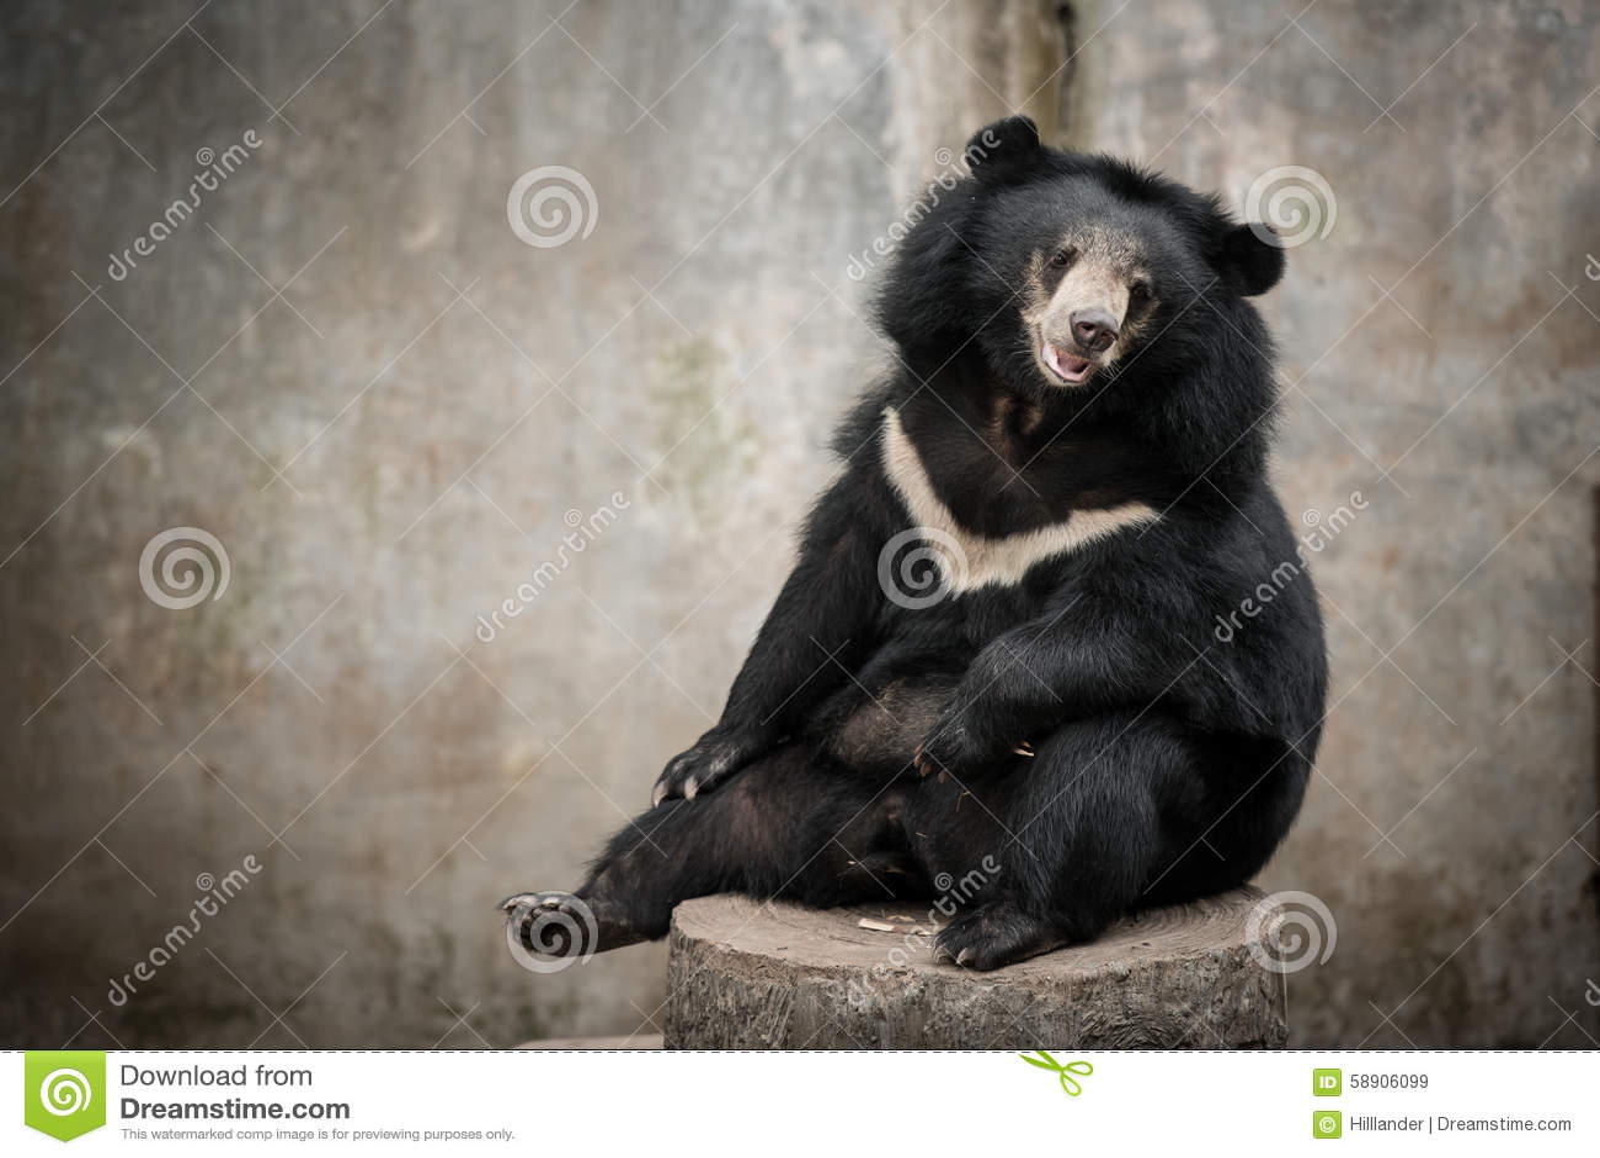 Can asian bear black opinion